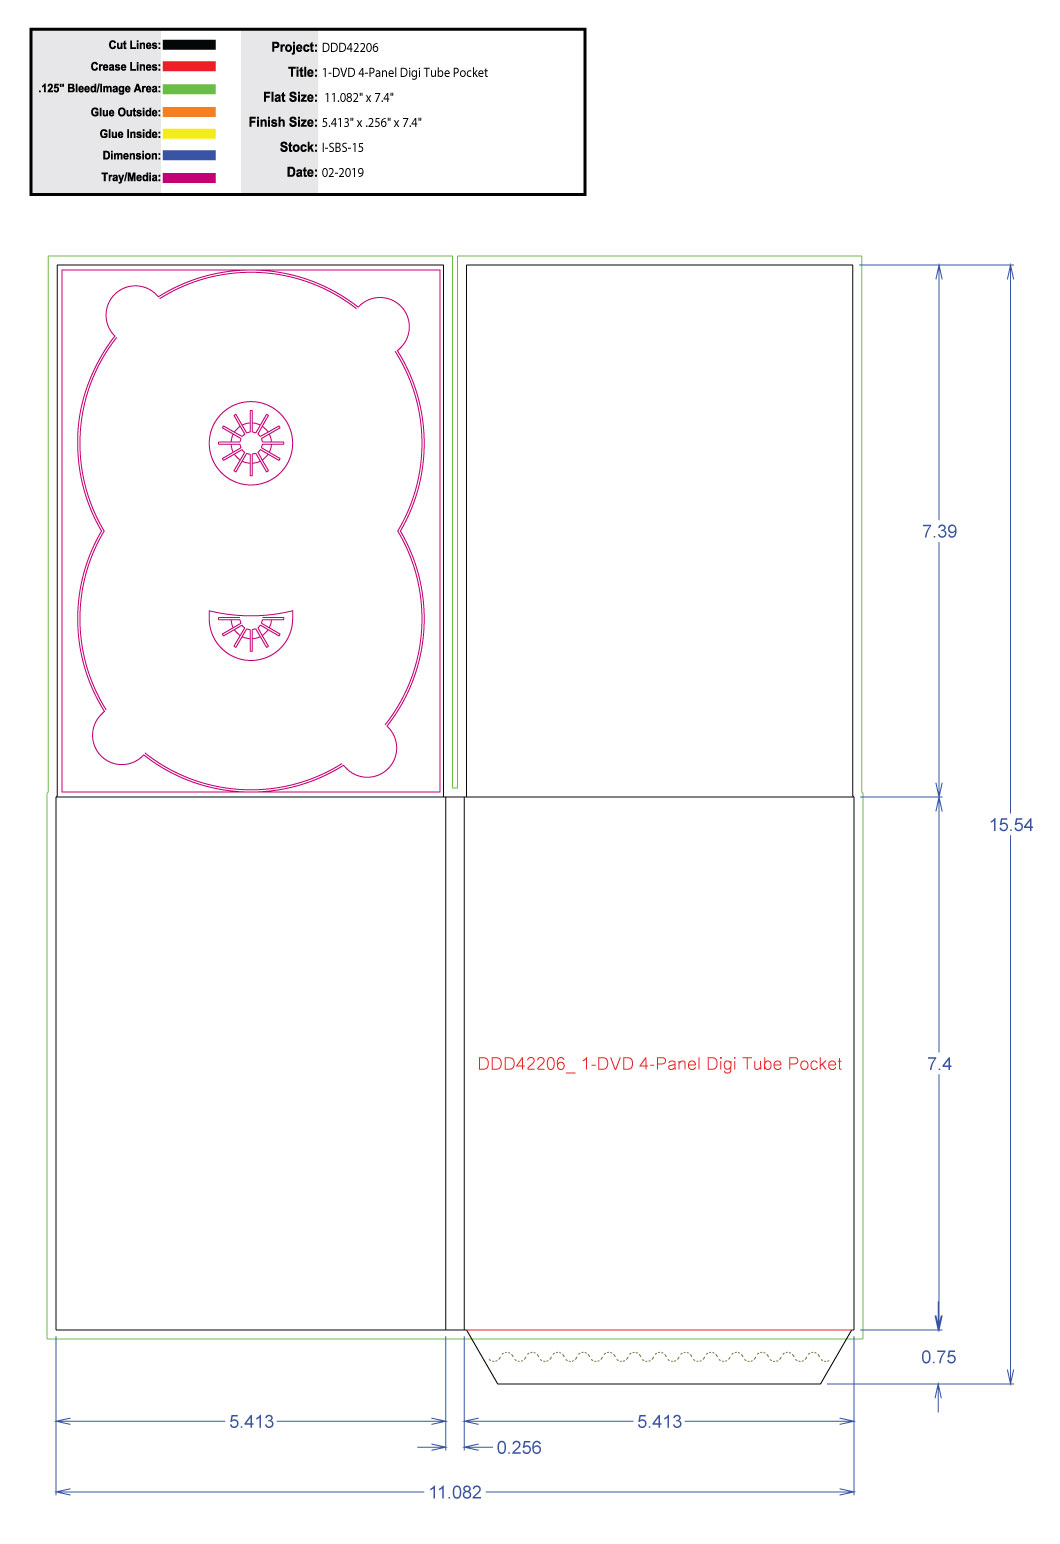 DDD42206 DVD 4 Panel Digi 1 Tray, Tube Pocket